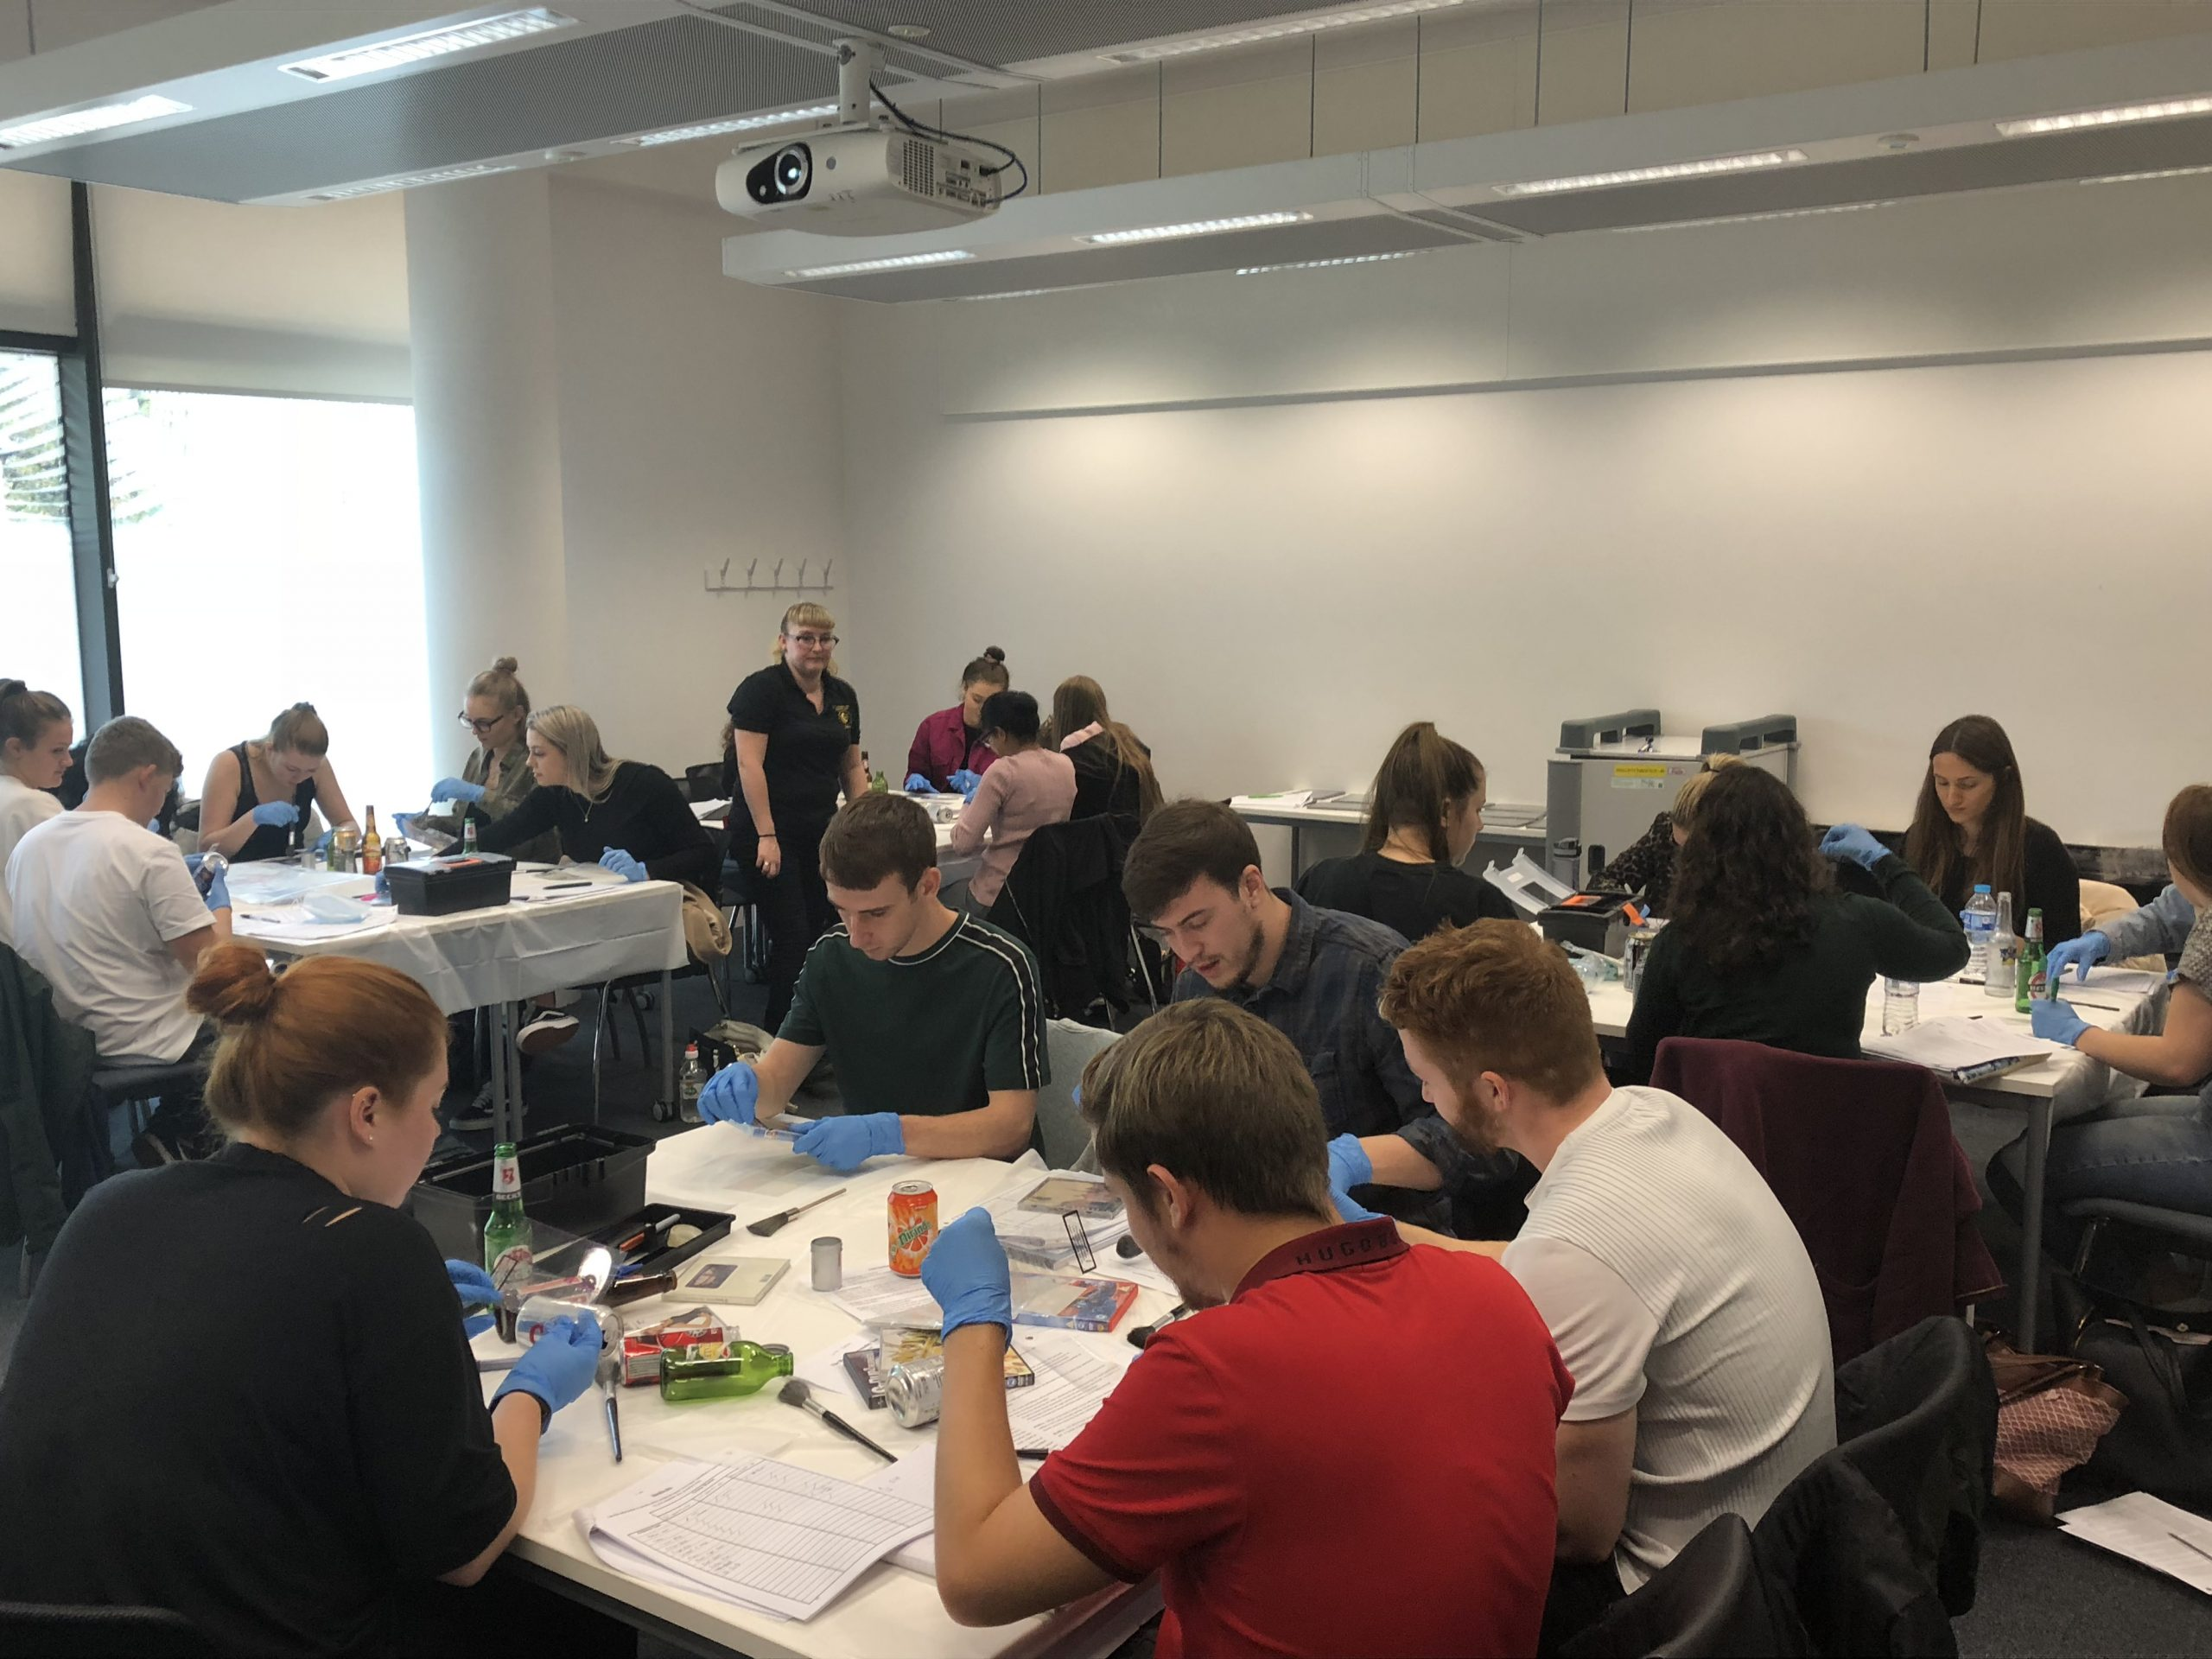 CSI Training and Events - CSI Educational Workshops - University Students examining items for fingerprints